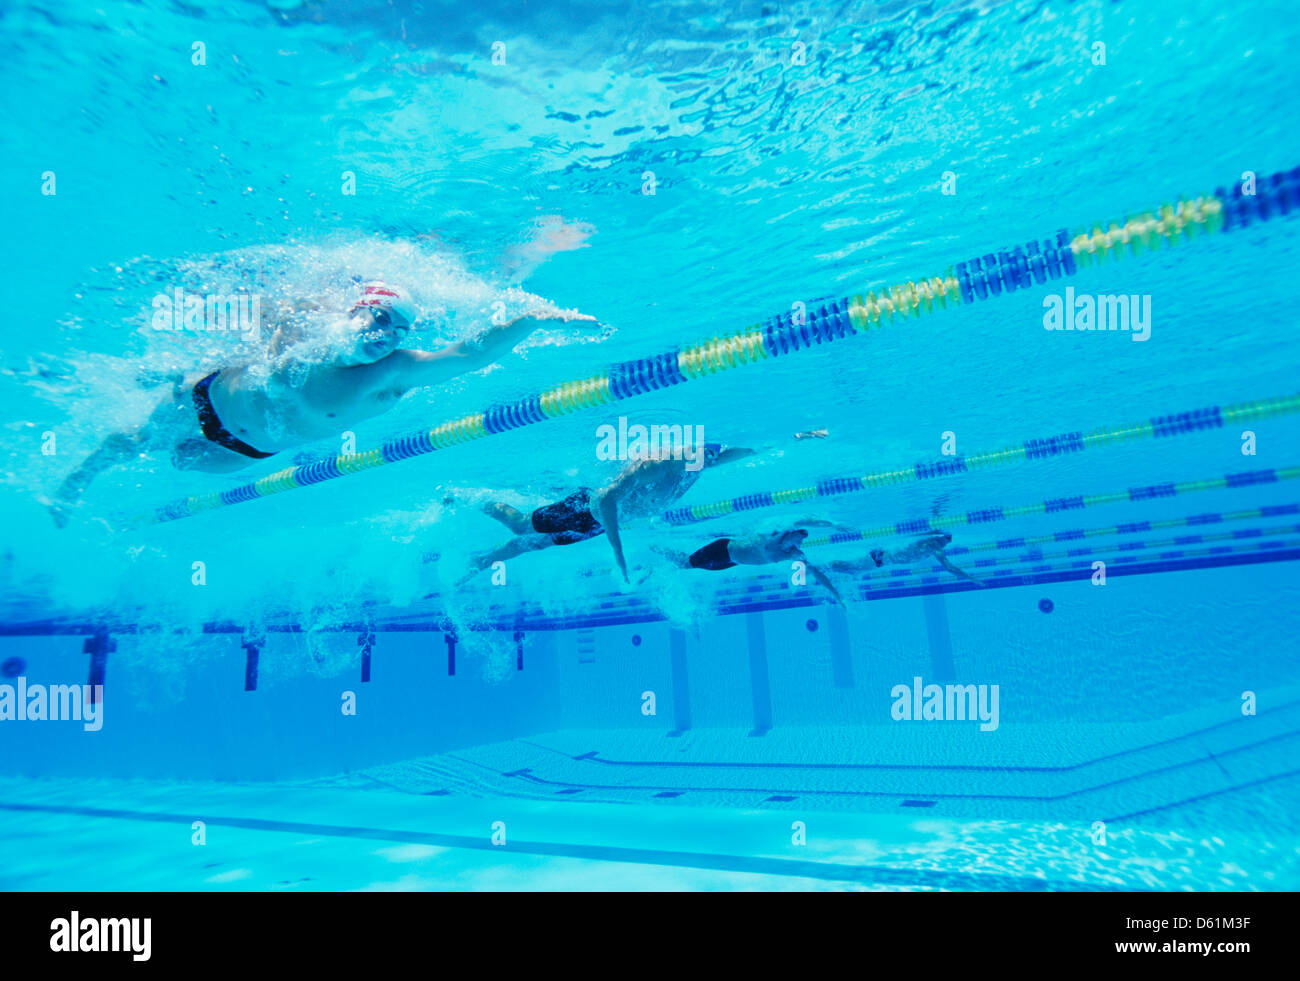 Riprese subacquee di quattro maschi thletes competere in piscina Immagini Stock